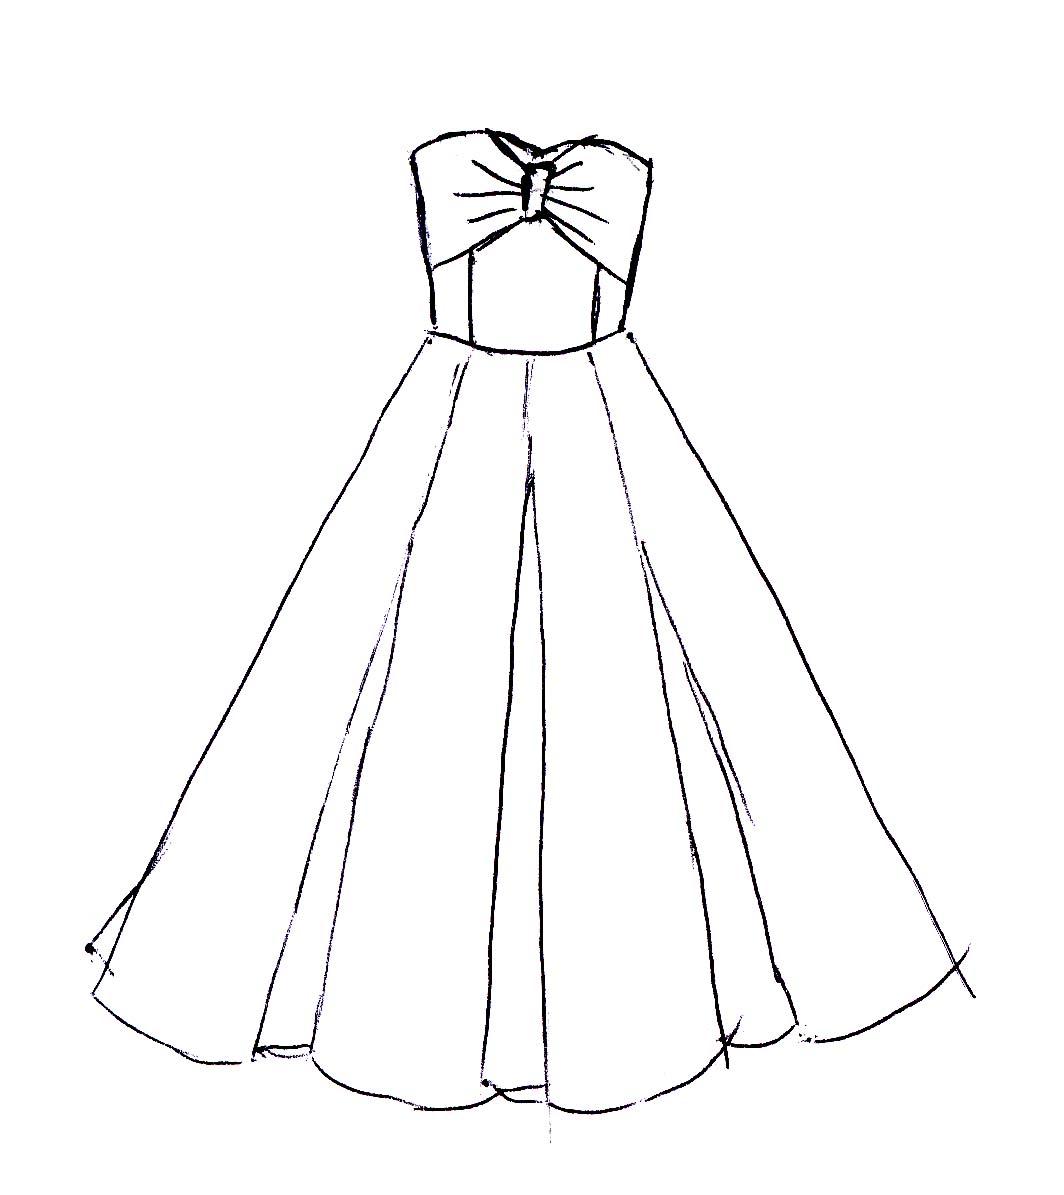 Easy Dress Drawing At Getdrawings